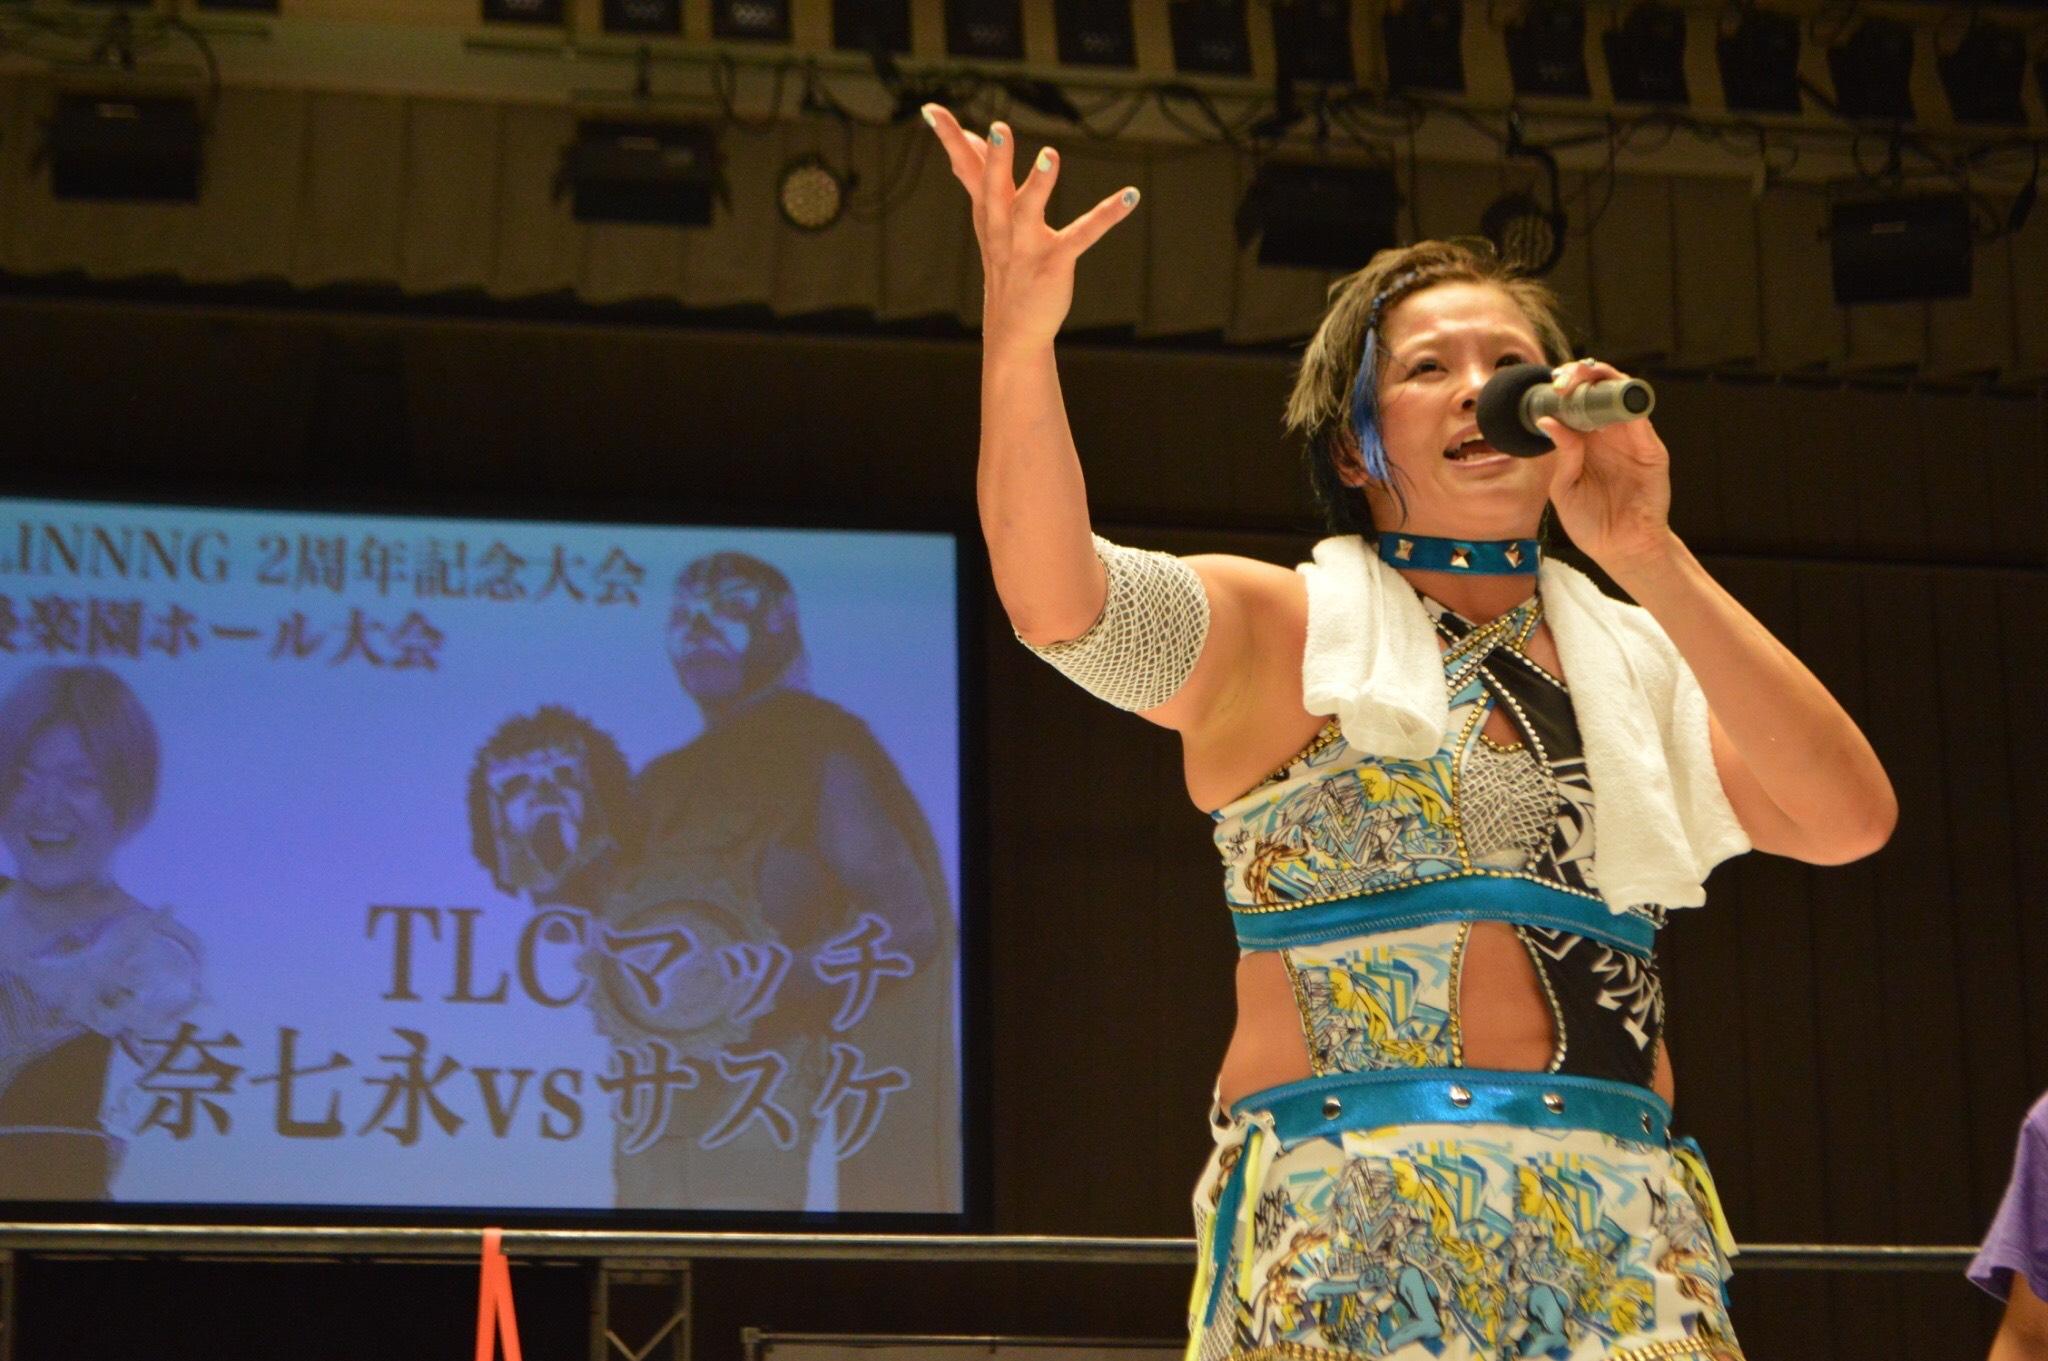 【SEAdLINNNG】8.24 SEAdLINNNG2周年記念大会で〈TLCルール シングルマッチ〉 高橋奈七永 vs ザ・グレート・サスケ戦が決定!